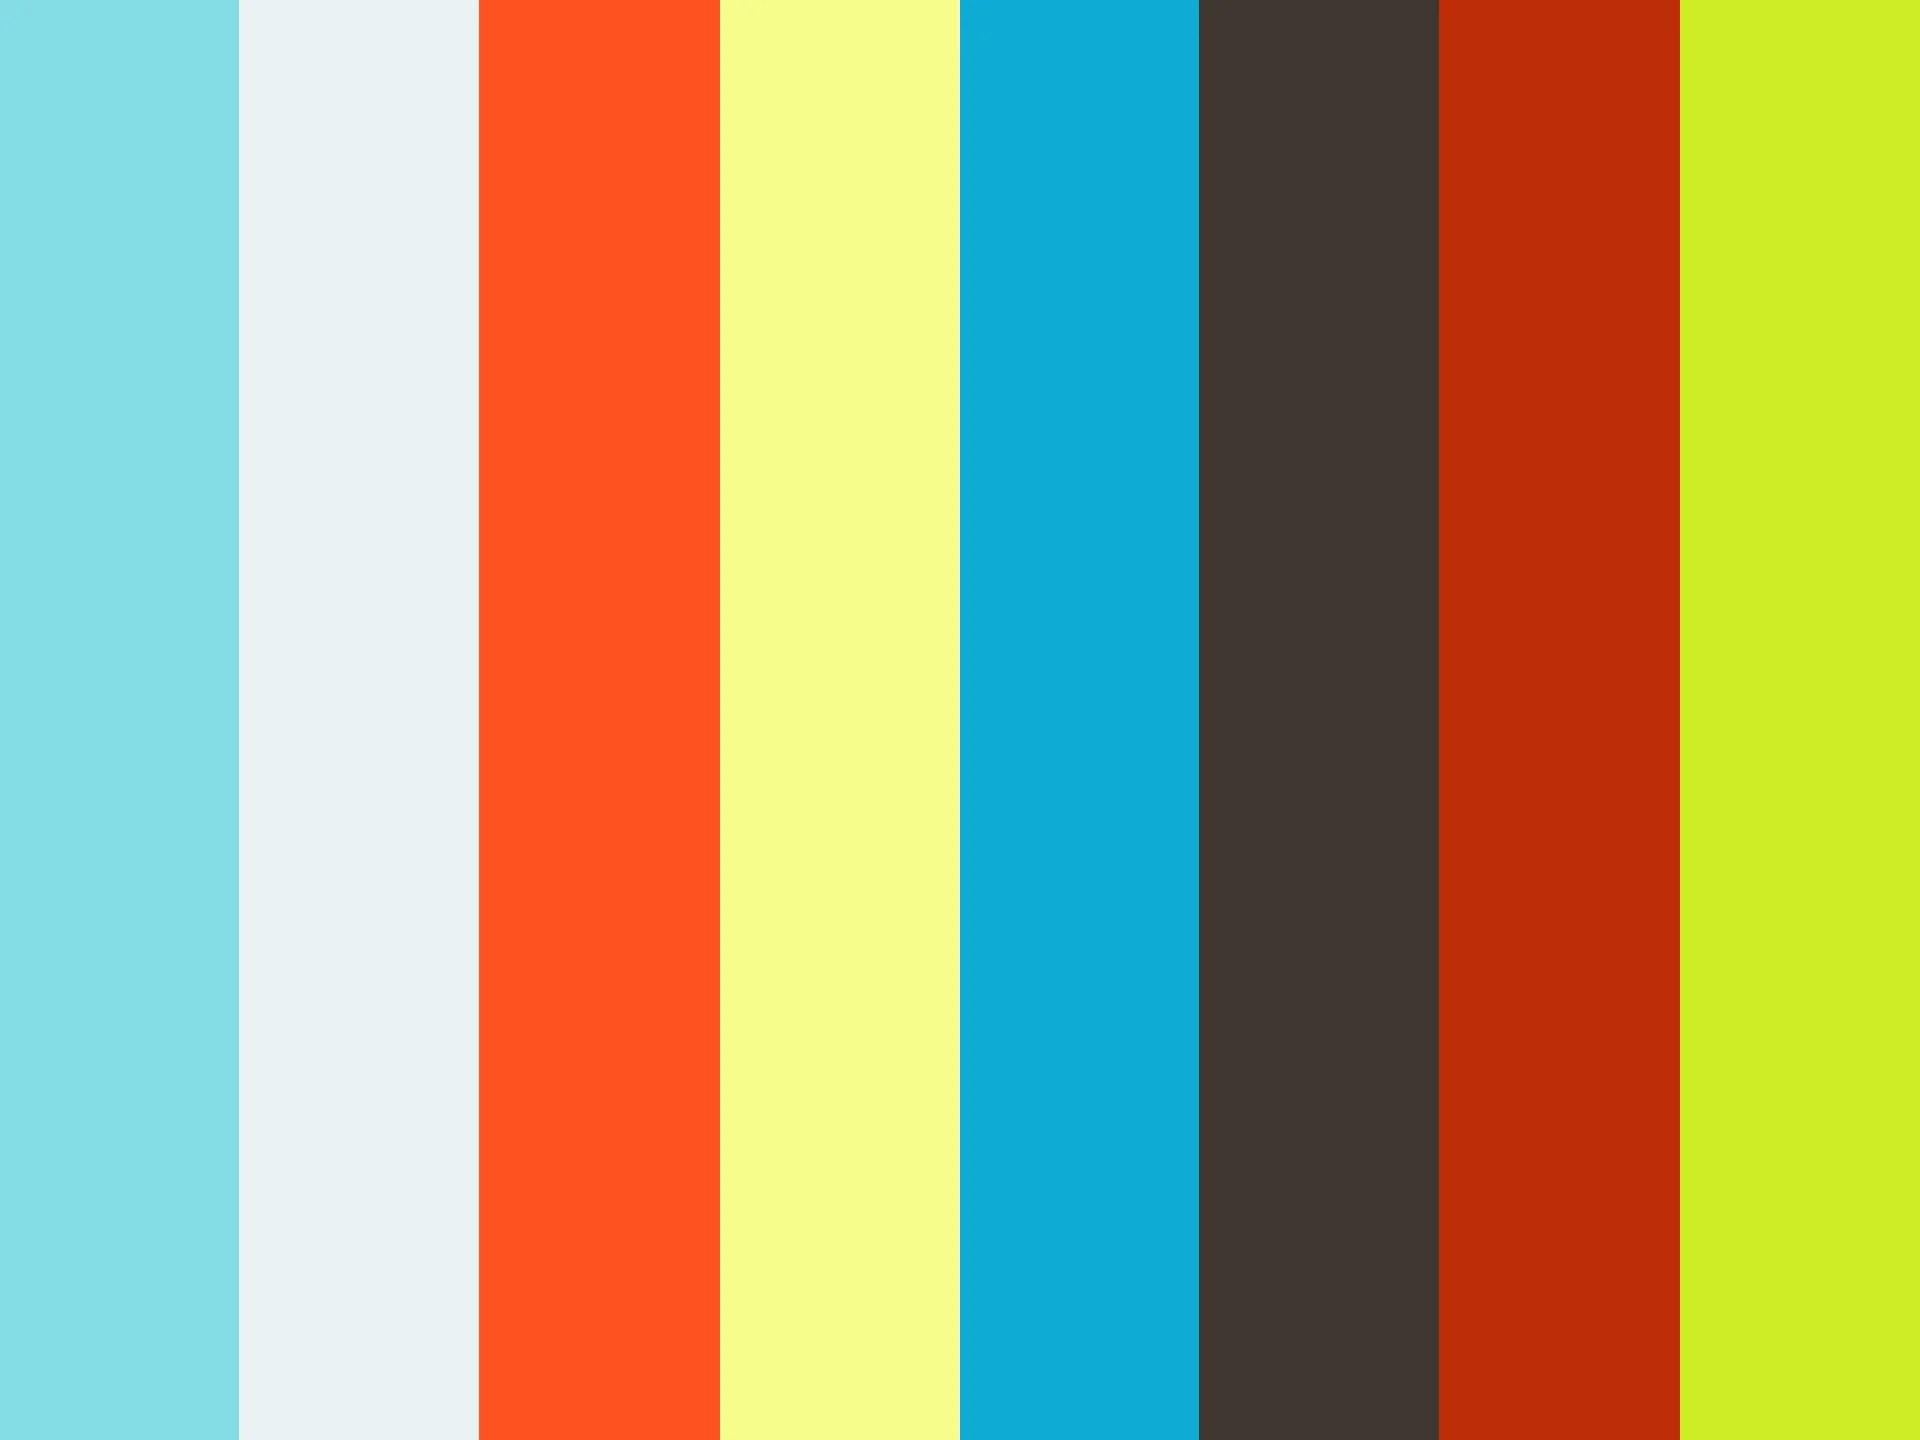 interview susi muddiman director tweed regional gallery margaret olley art centre mgnsw [ 1700 x 956 Pixel ]